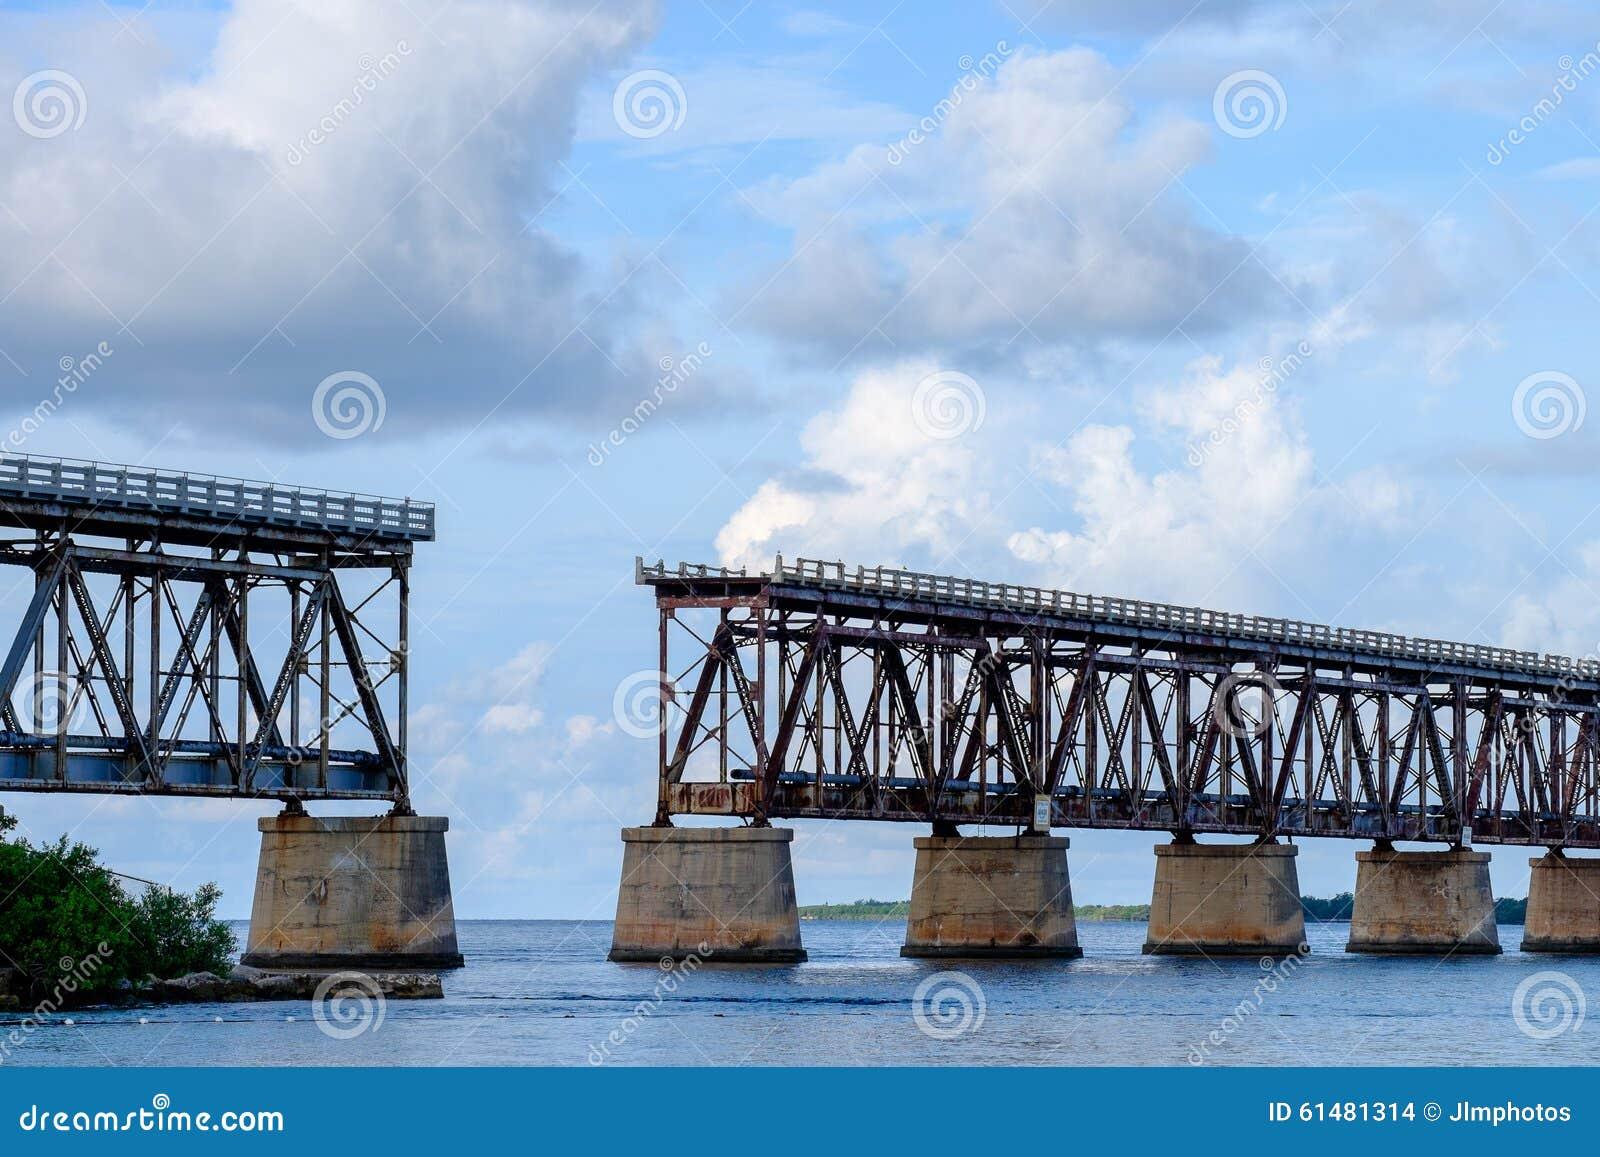 The old Florida East Coast Railway Pratt Truss bridge spanning b